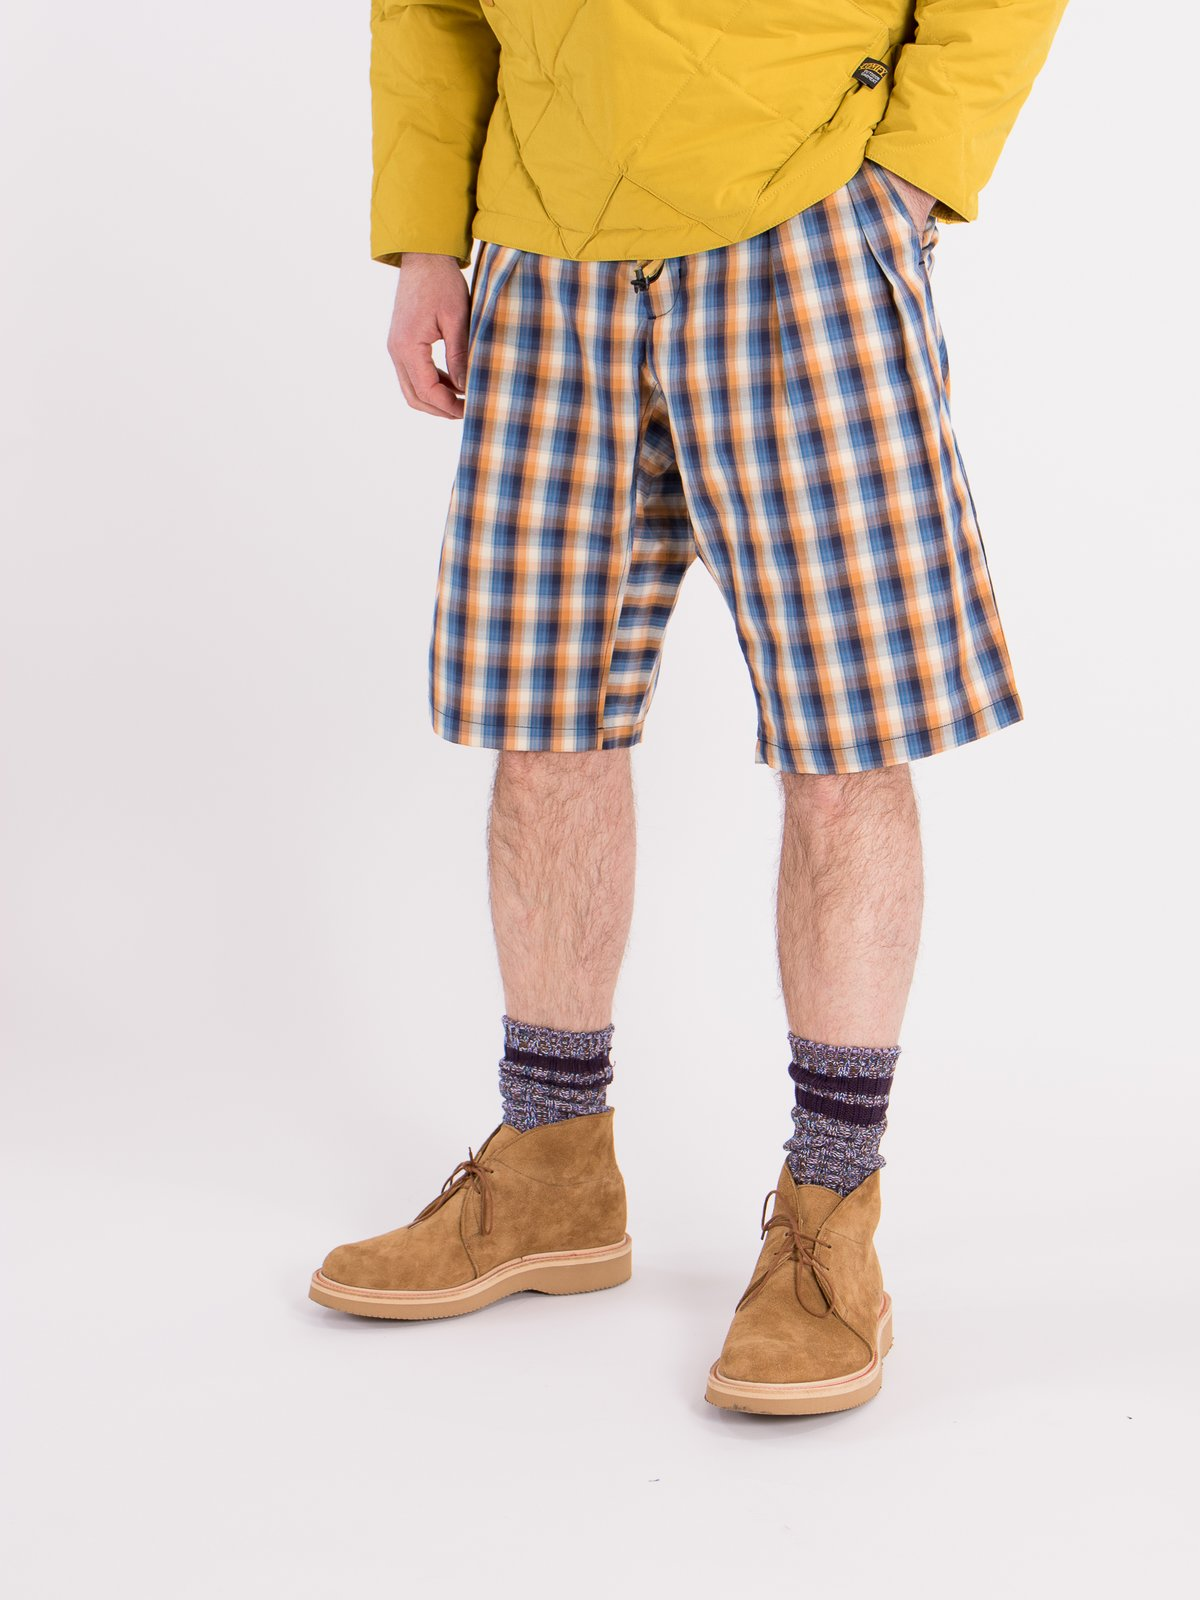 Blue/Orange Plaid Oxford Vancloth Drop Crotch Shorts - Image 2